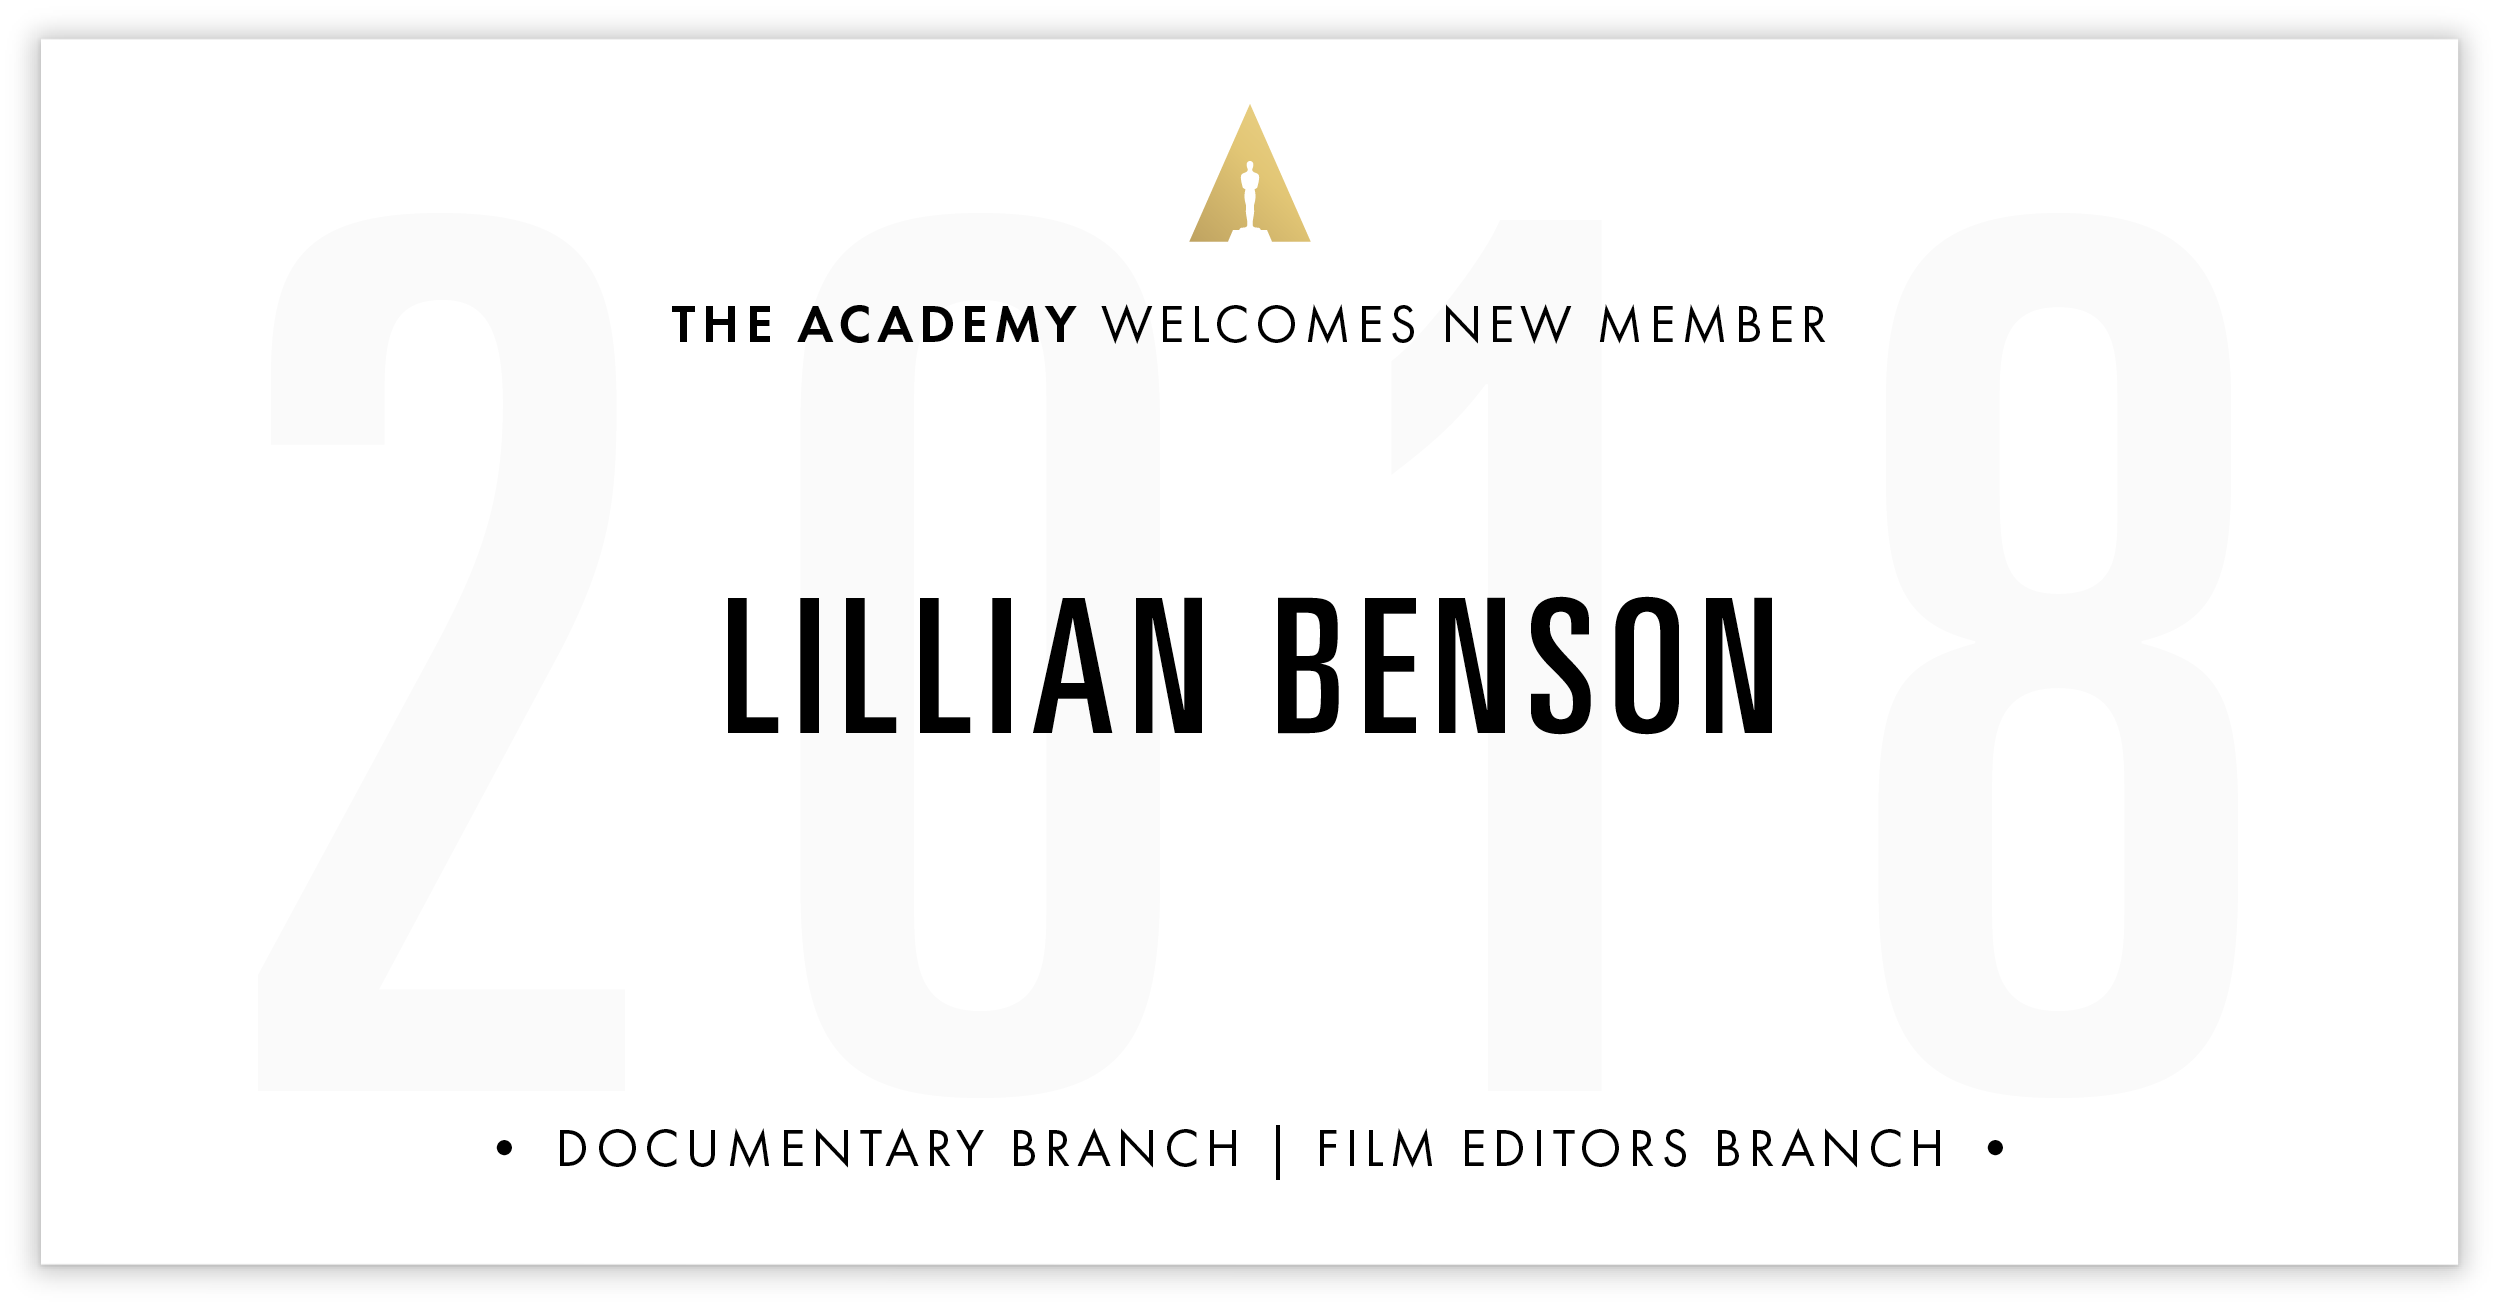 Lillian Benson is invited!